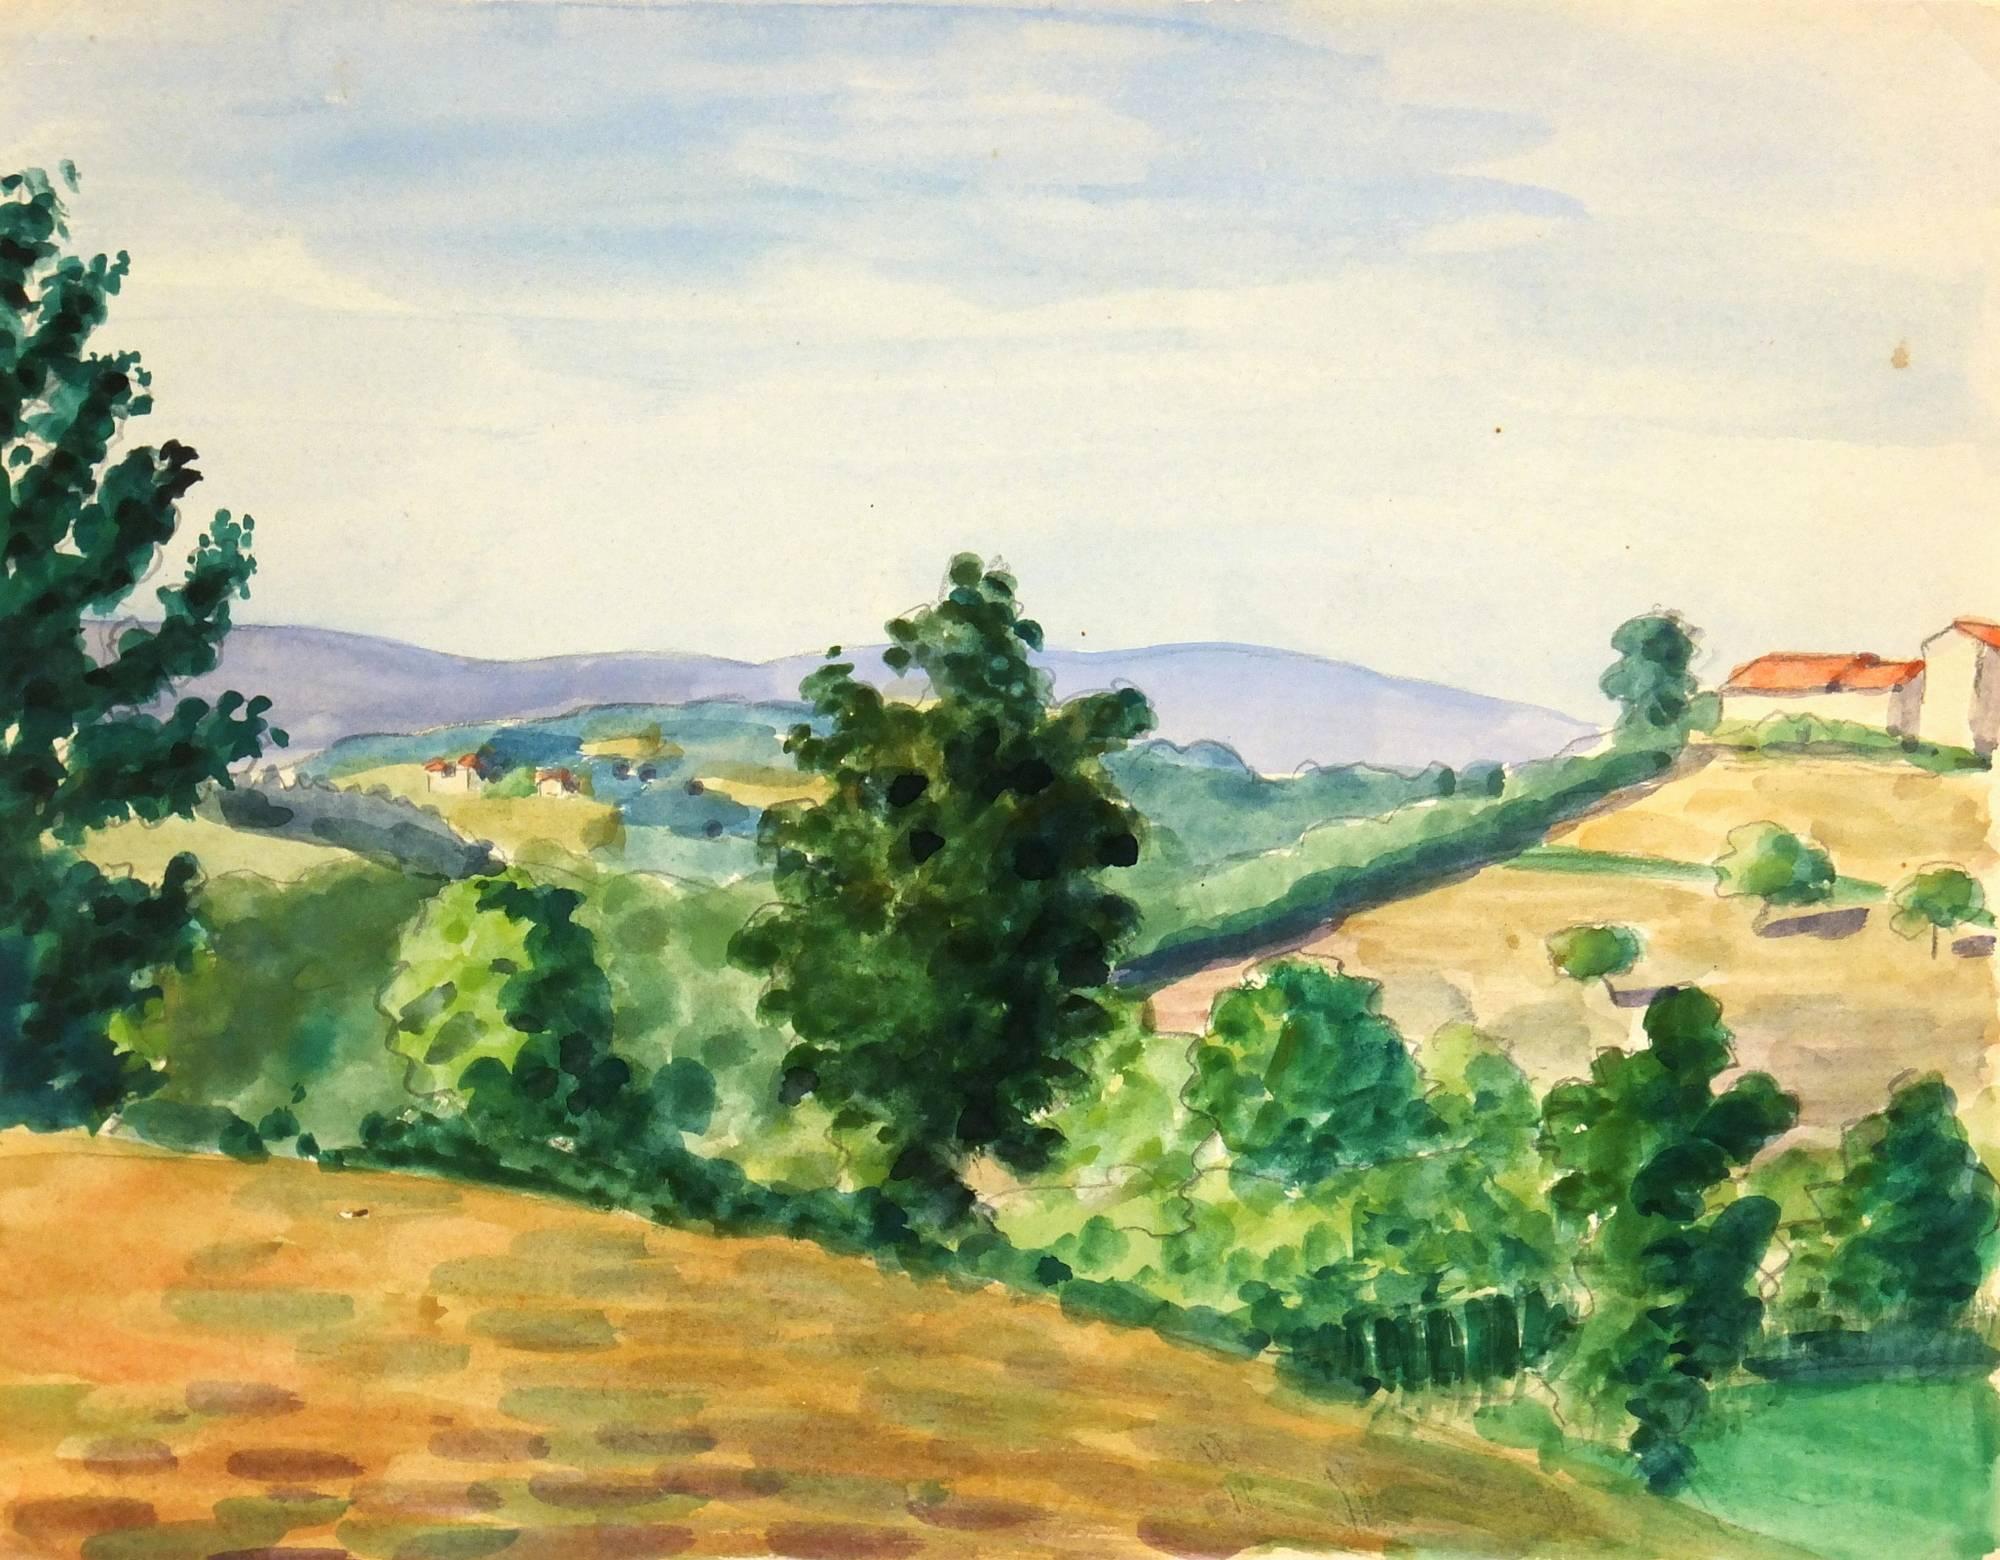 Watercolor Country Landscape, C. 1950